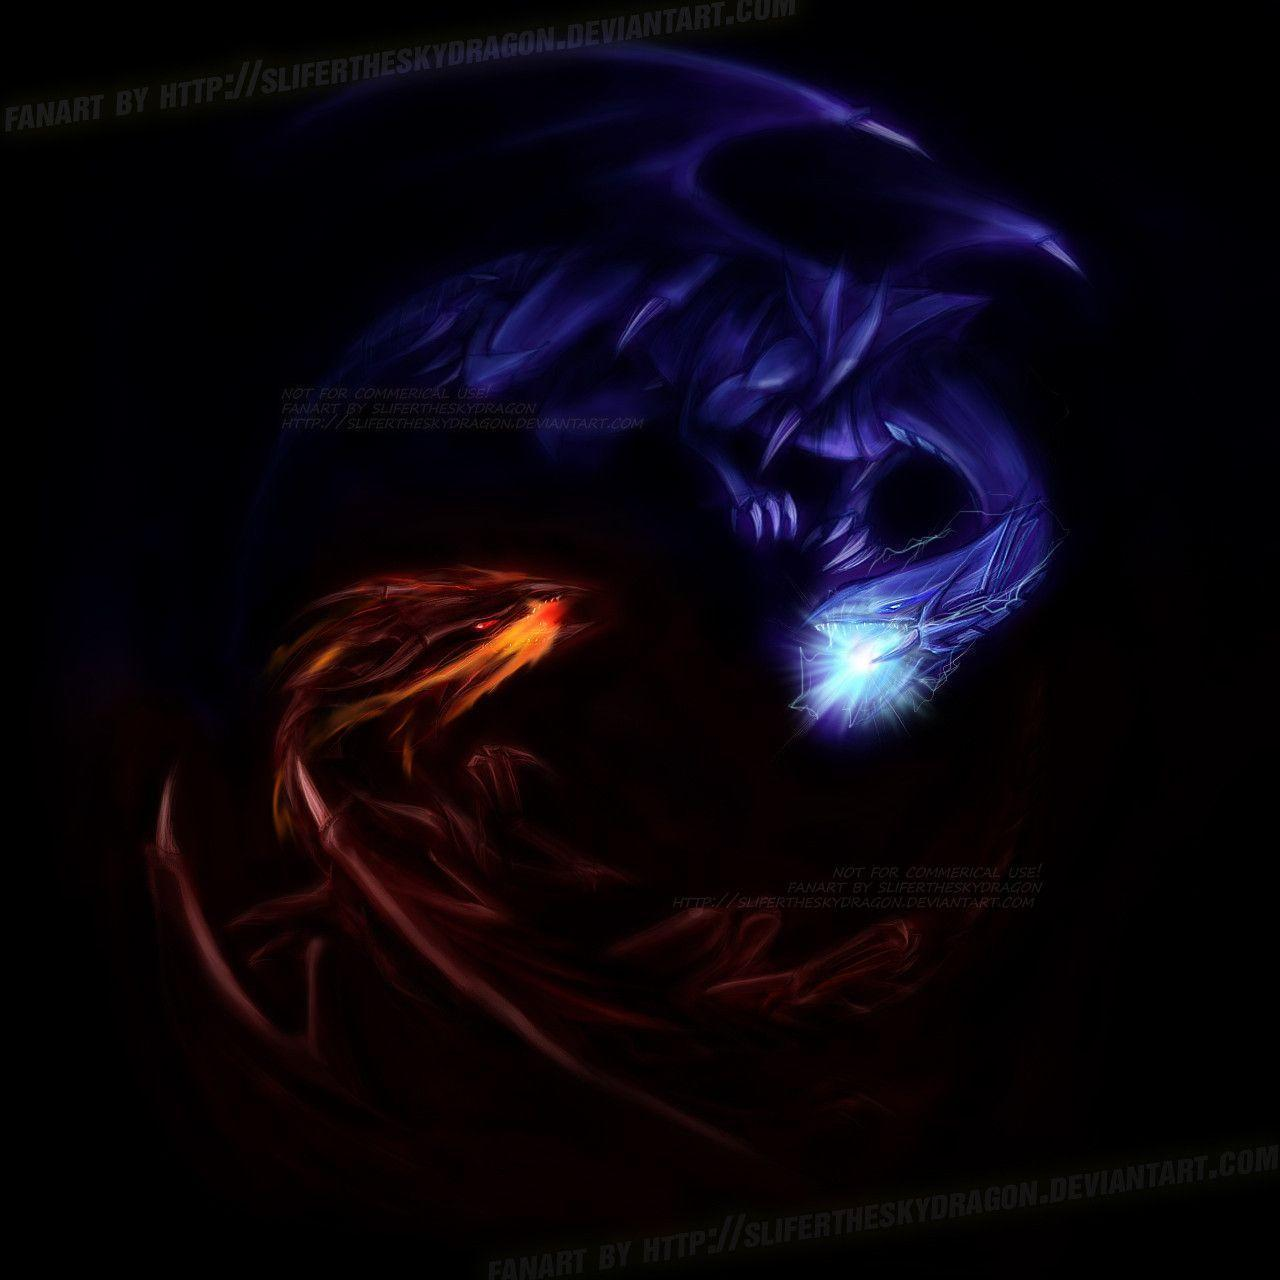 Oh White Black Dragon Gi Blue White Eyes Dragon And Black Vs Eyes Red Yu